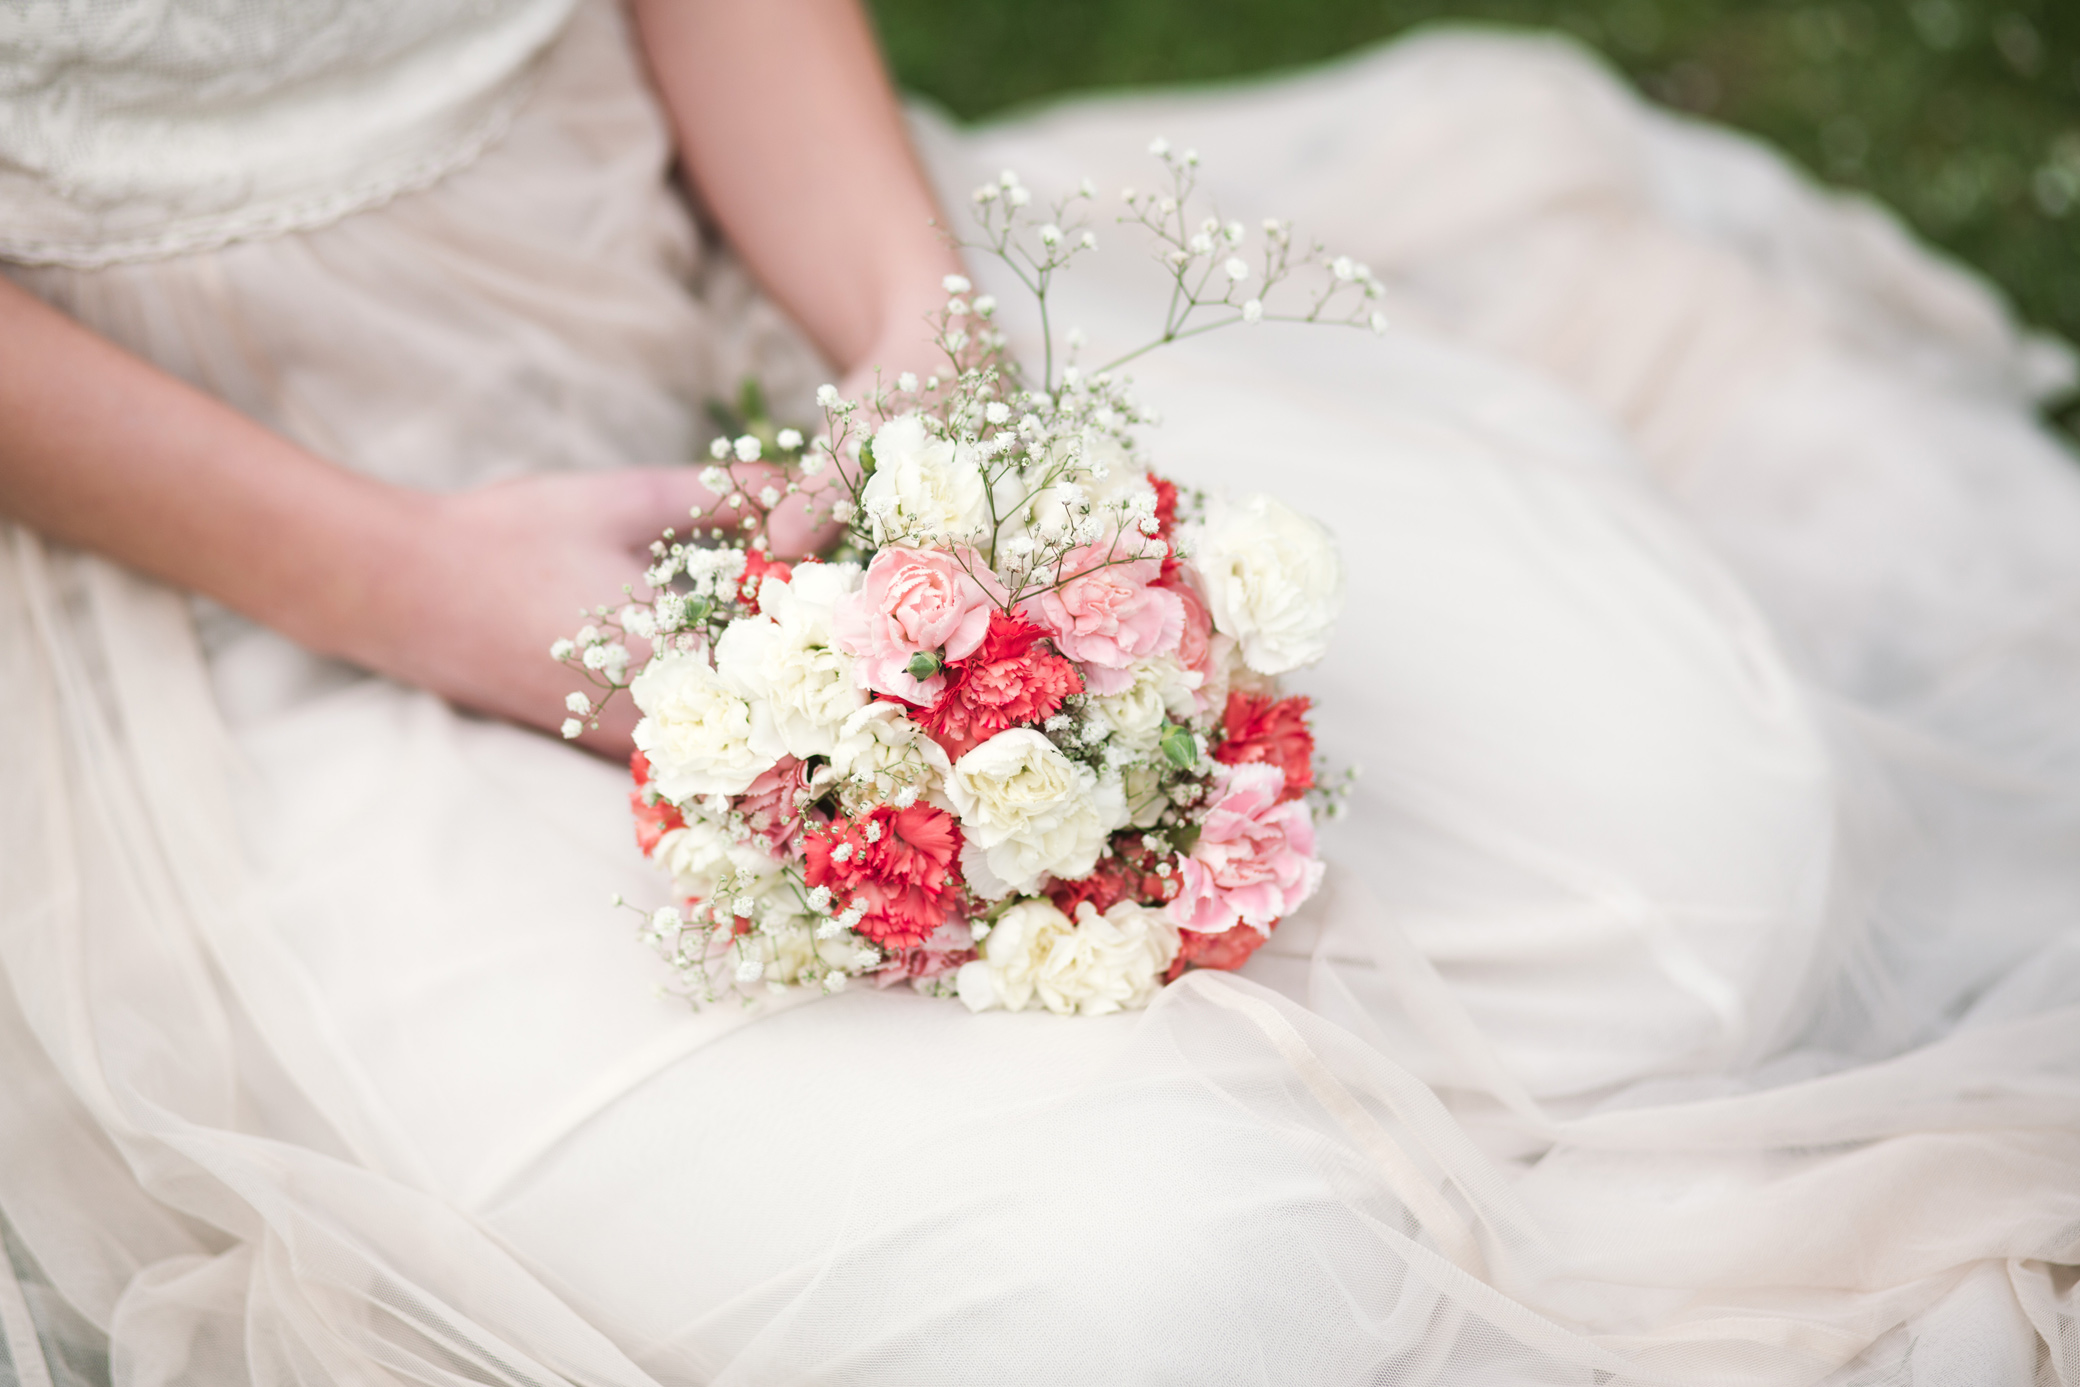 styled-wedding-bridal-shoot-blossom-13